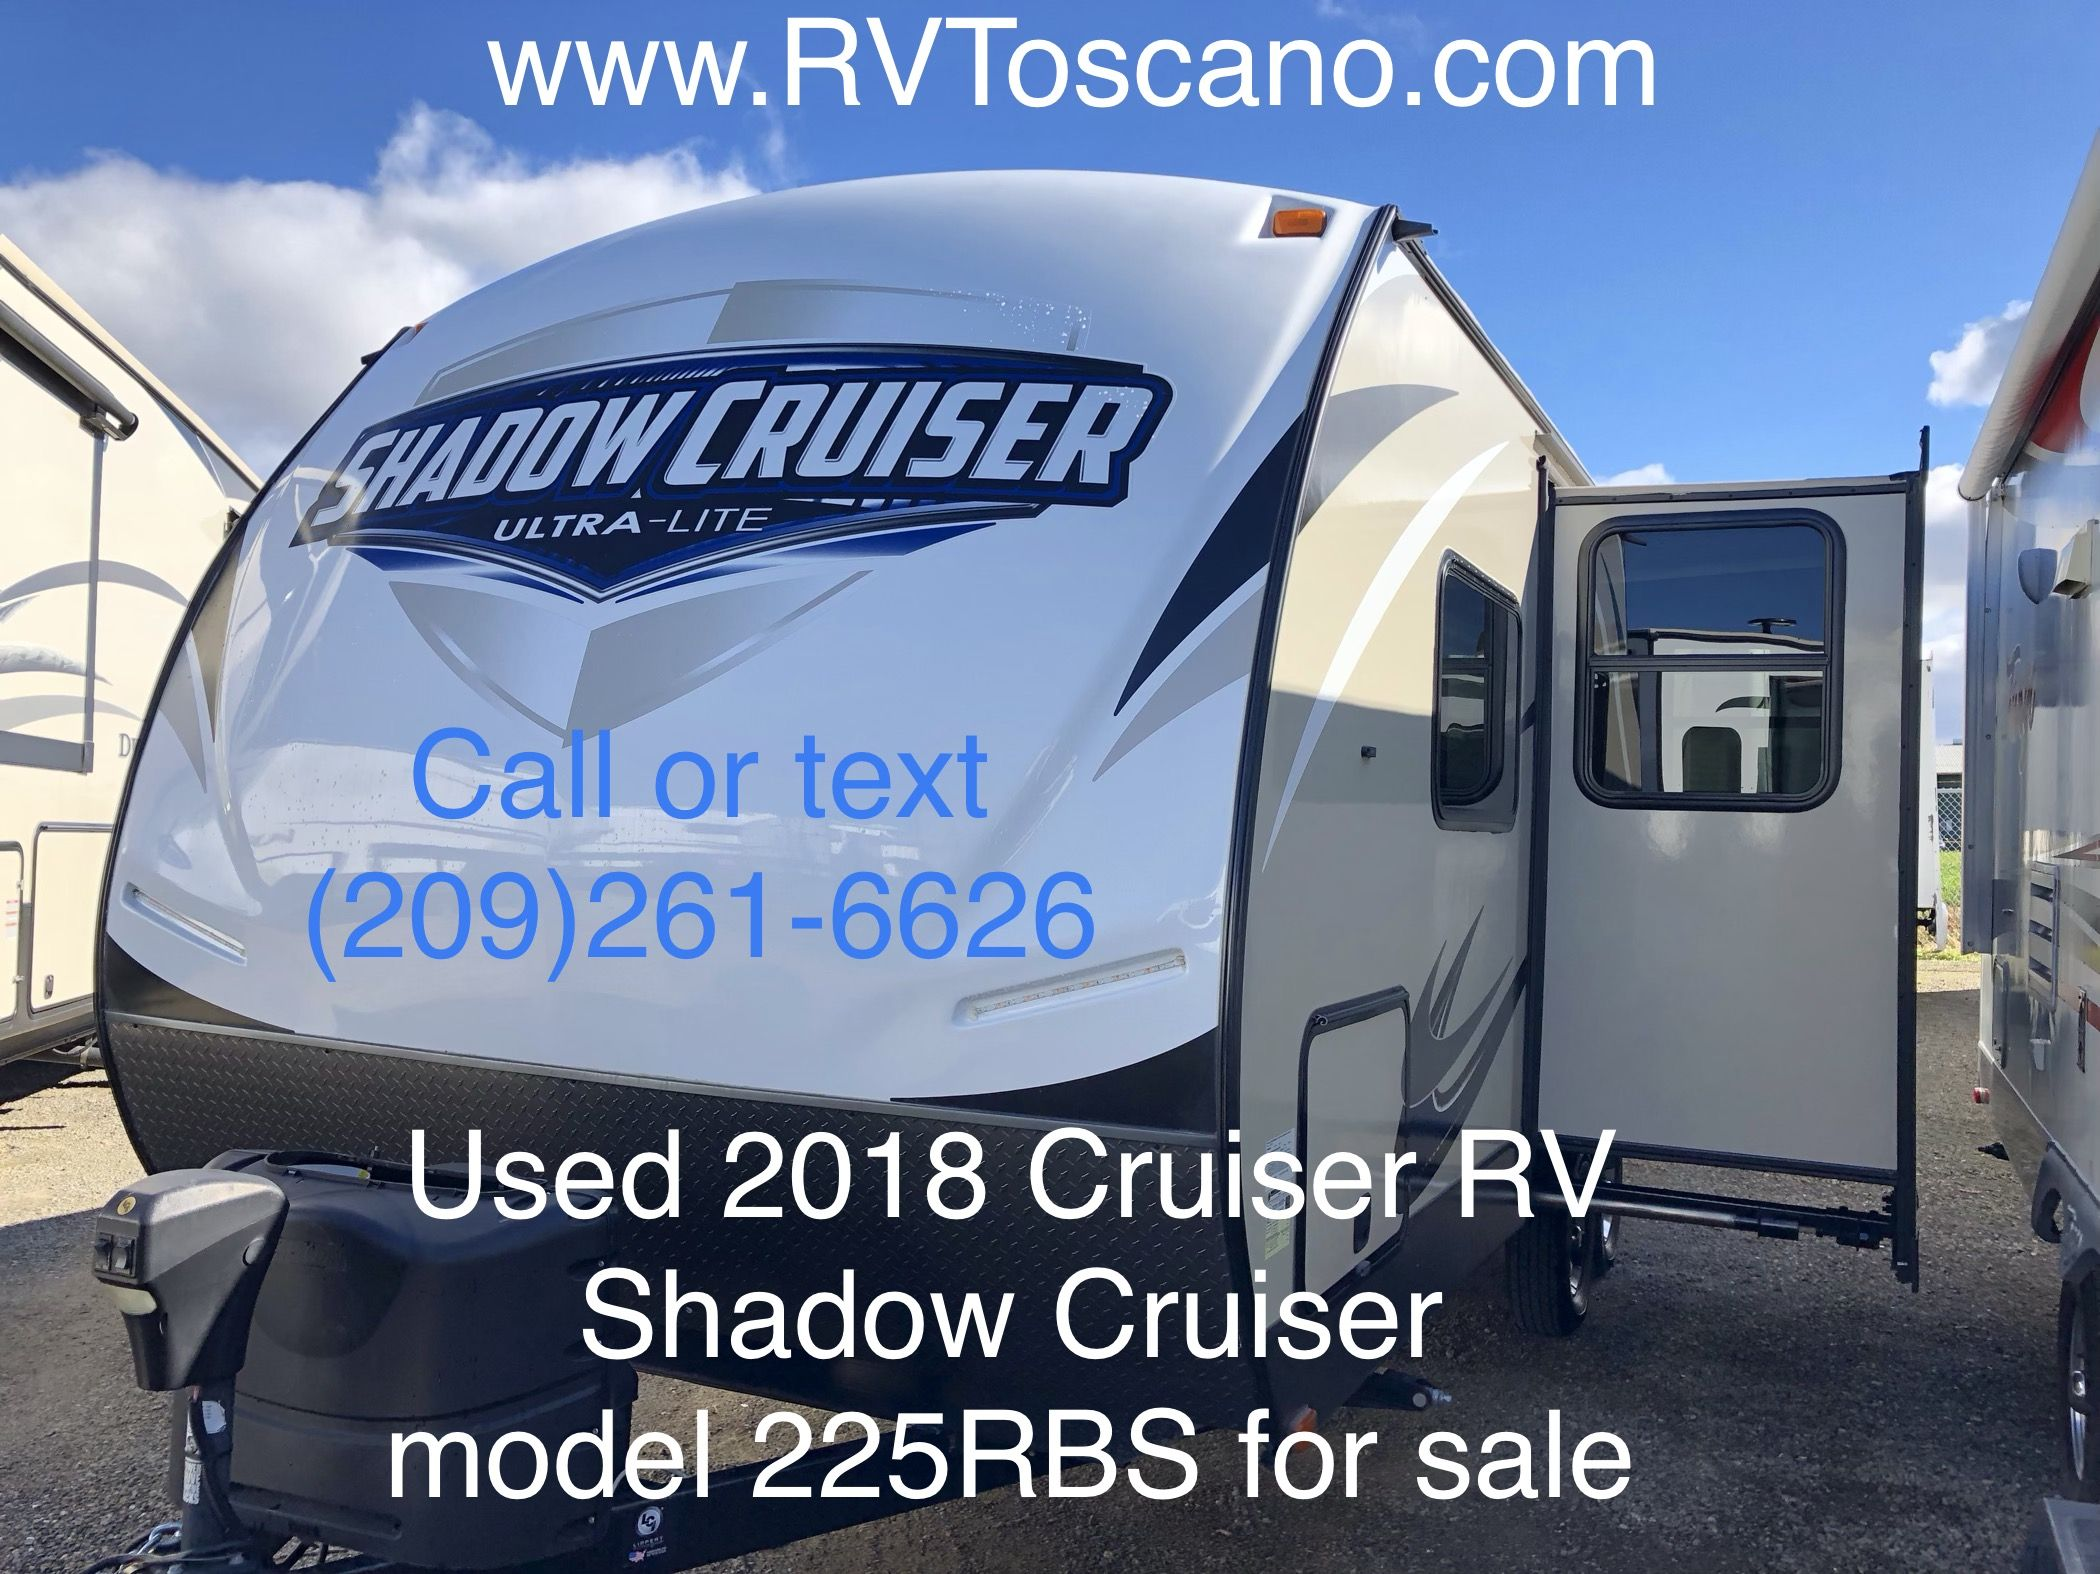 Barely Used 2018 Cruiser Shadow Cruiser 222rbs Travel Trailer Call